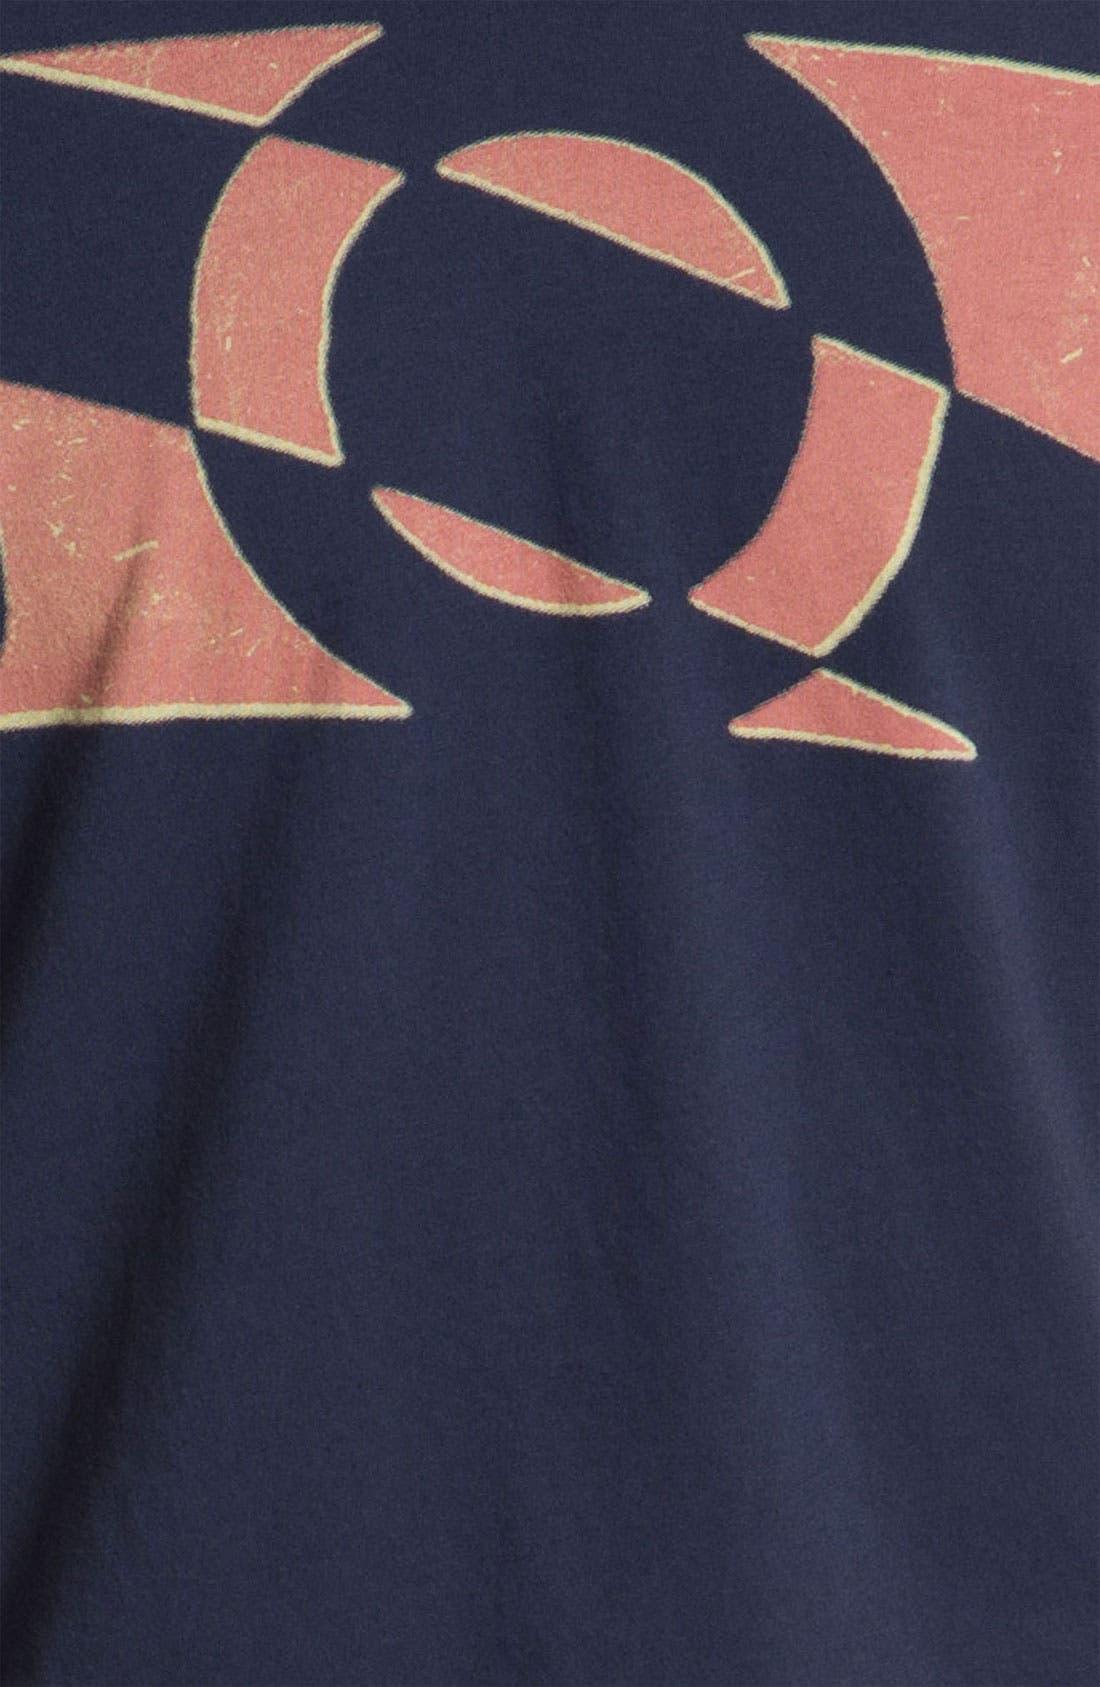 Alternate Image 3  - Sol Angeles 'Sol Saver' Graphic T-Shirt